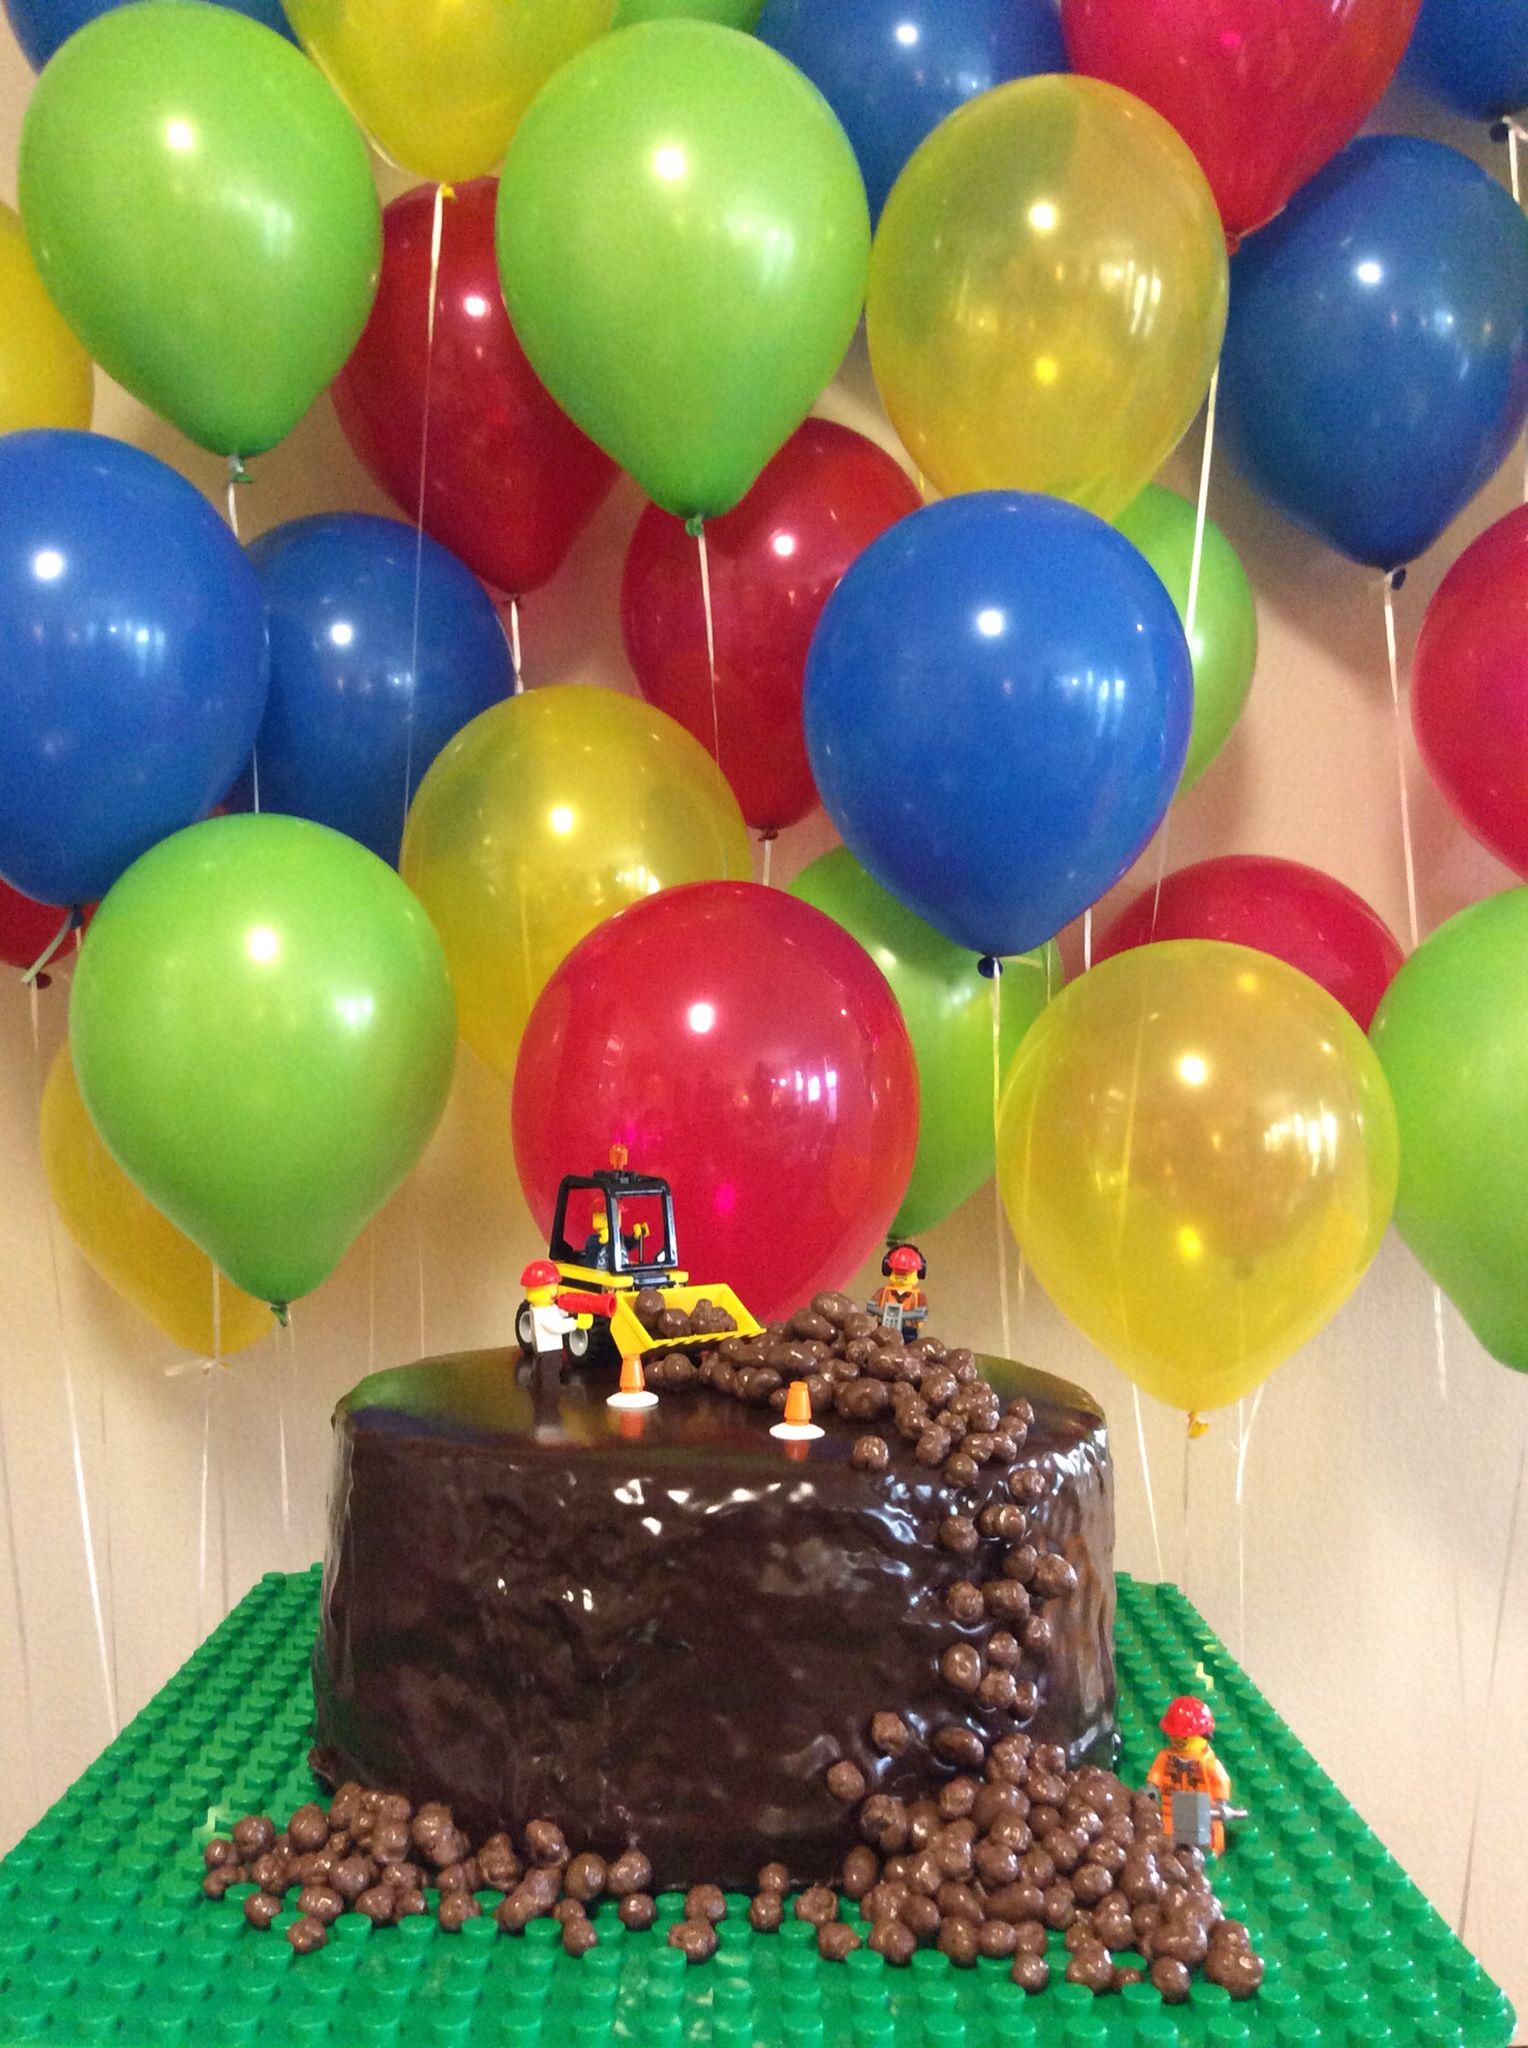 Lego birthday party balloons backdrop Love the colors Birthday